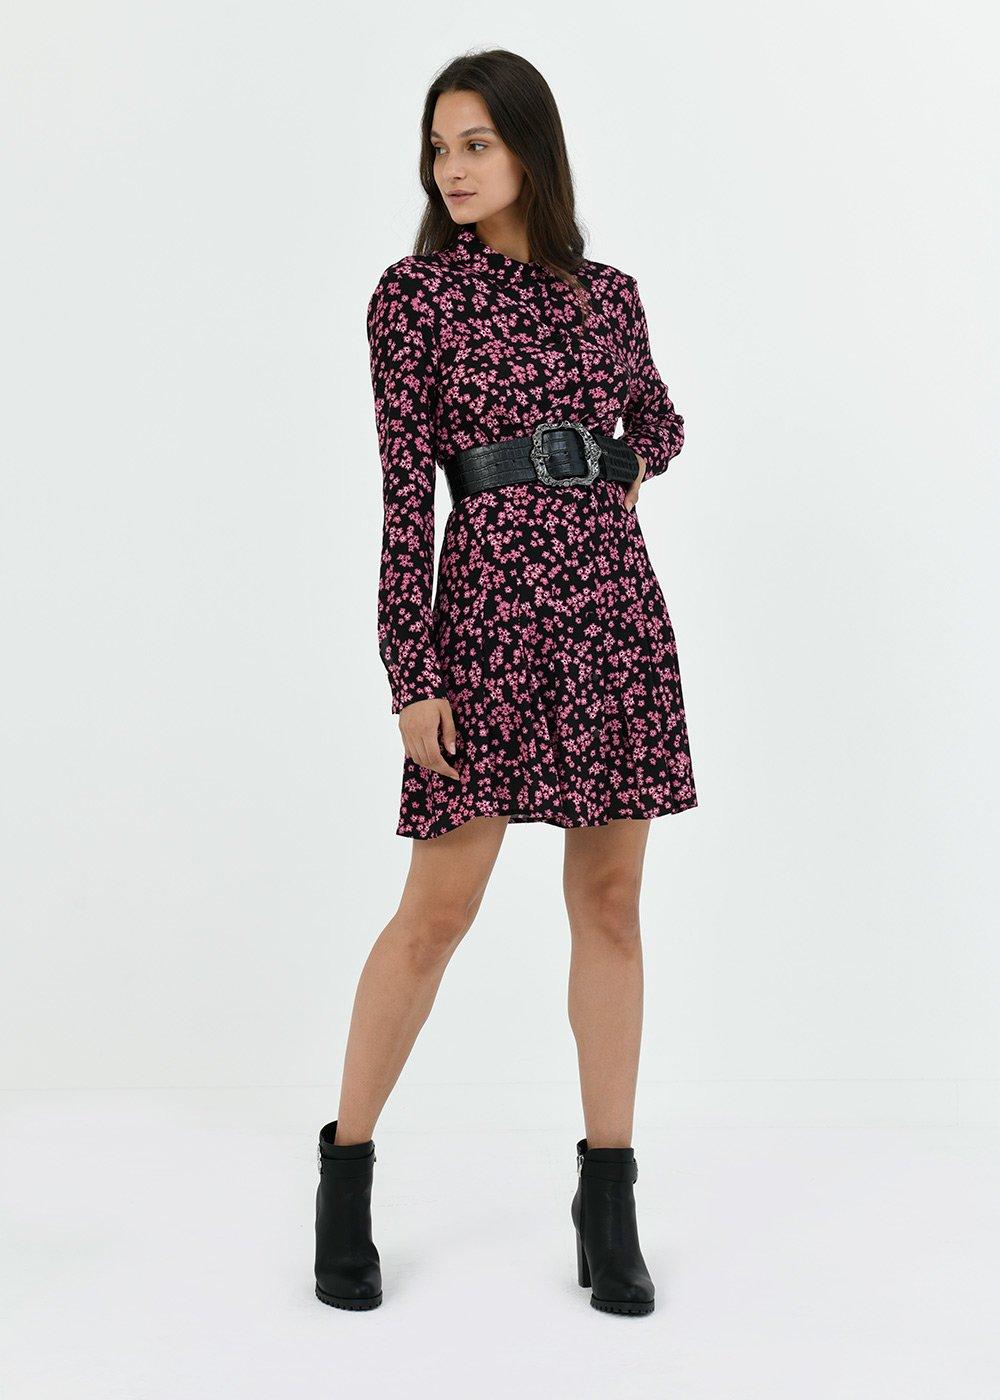 Alain dress with flower print - Black / Gloss Fantasia - Woman